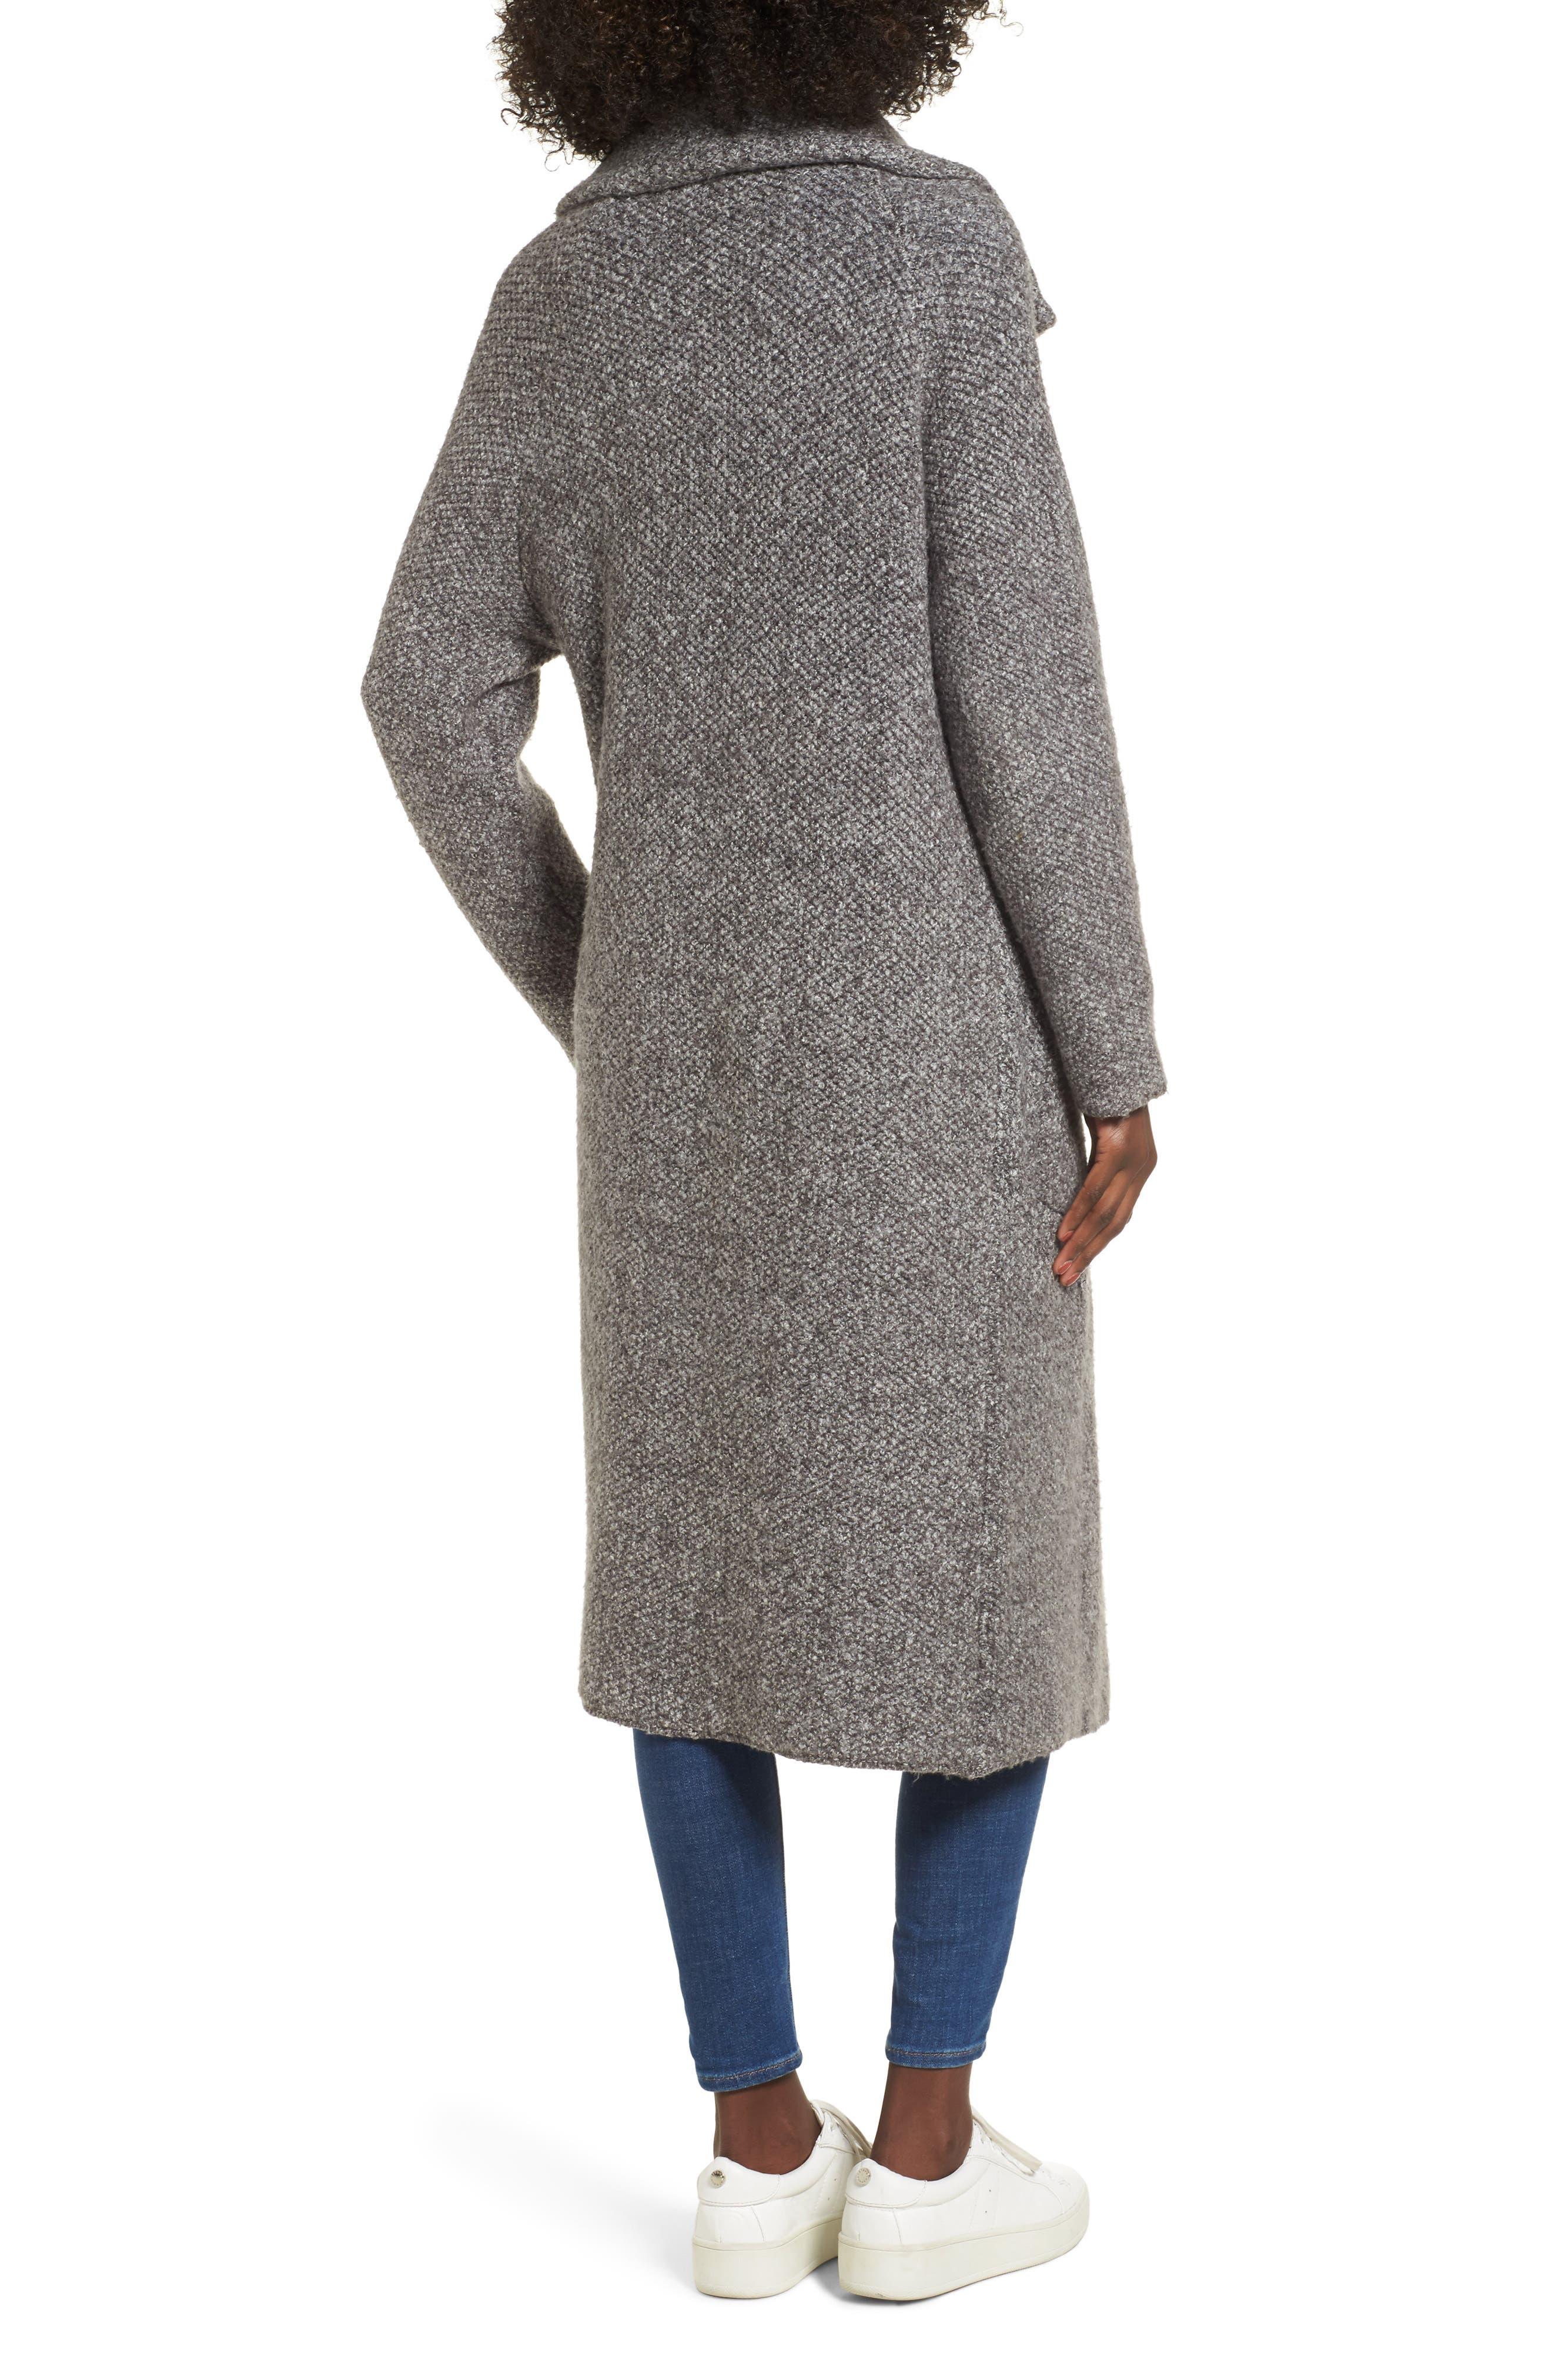 Kala Knit Sweater Jacket,                             Alternate thumbnail 2, color,                             030